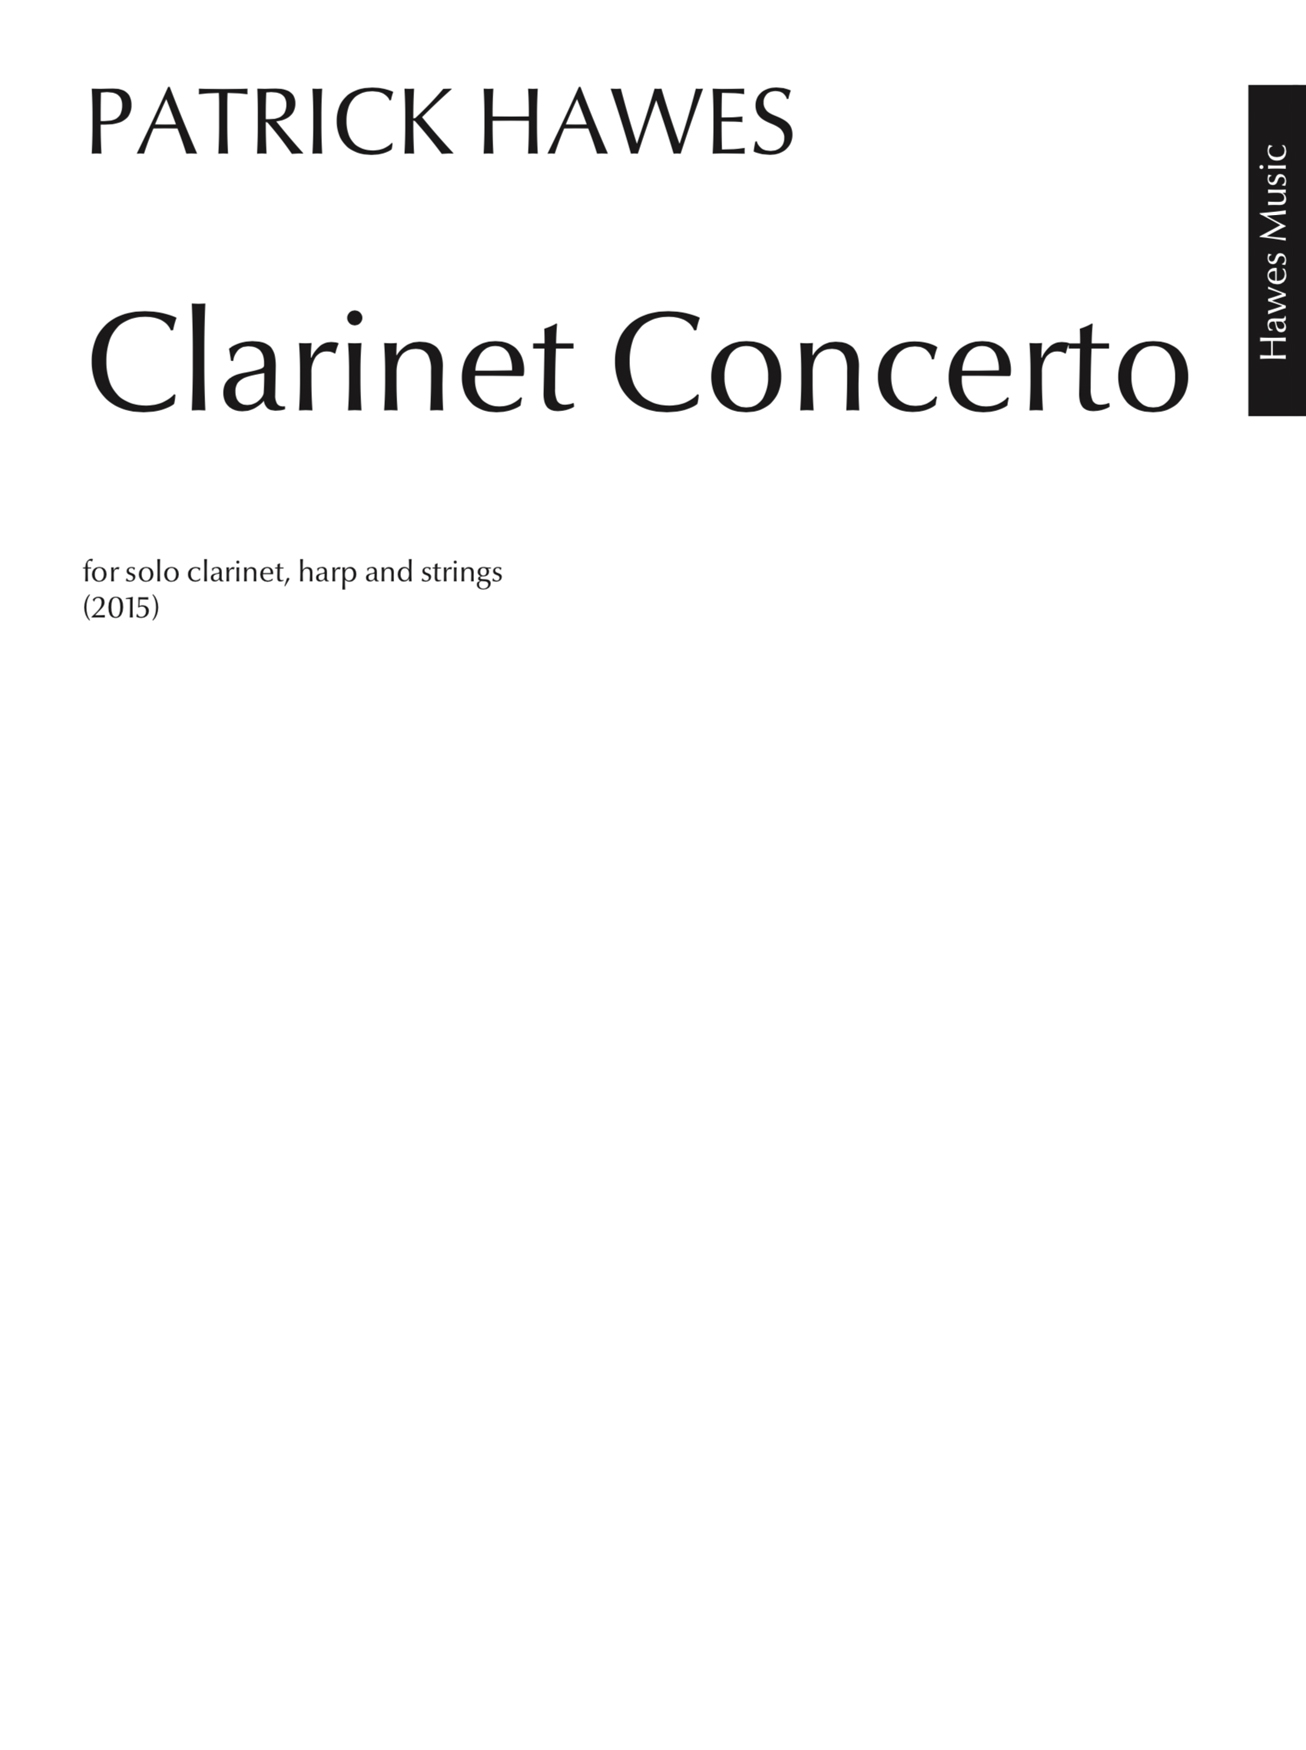 Patrick Hawes: Clarinet Concerto: Chamber Ensemble: Parts